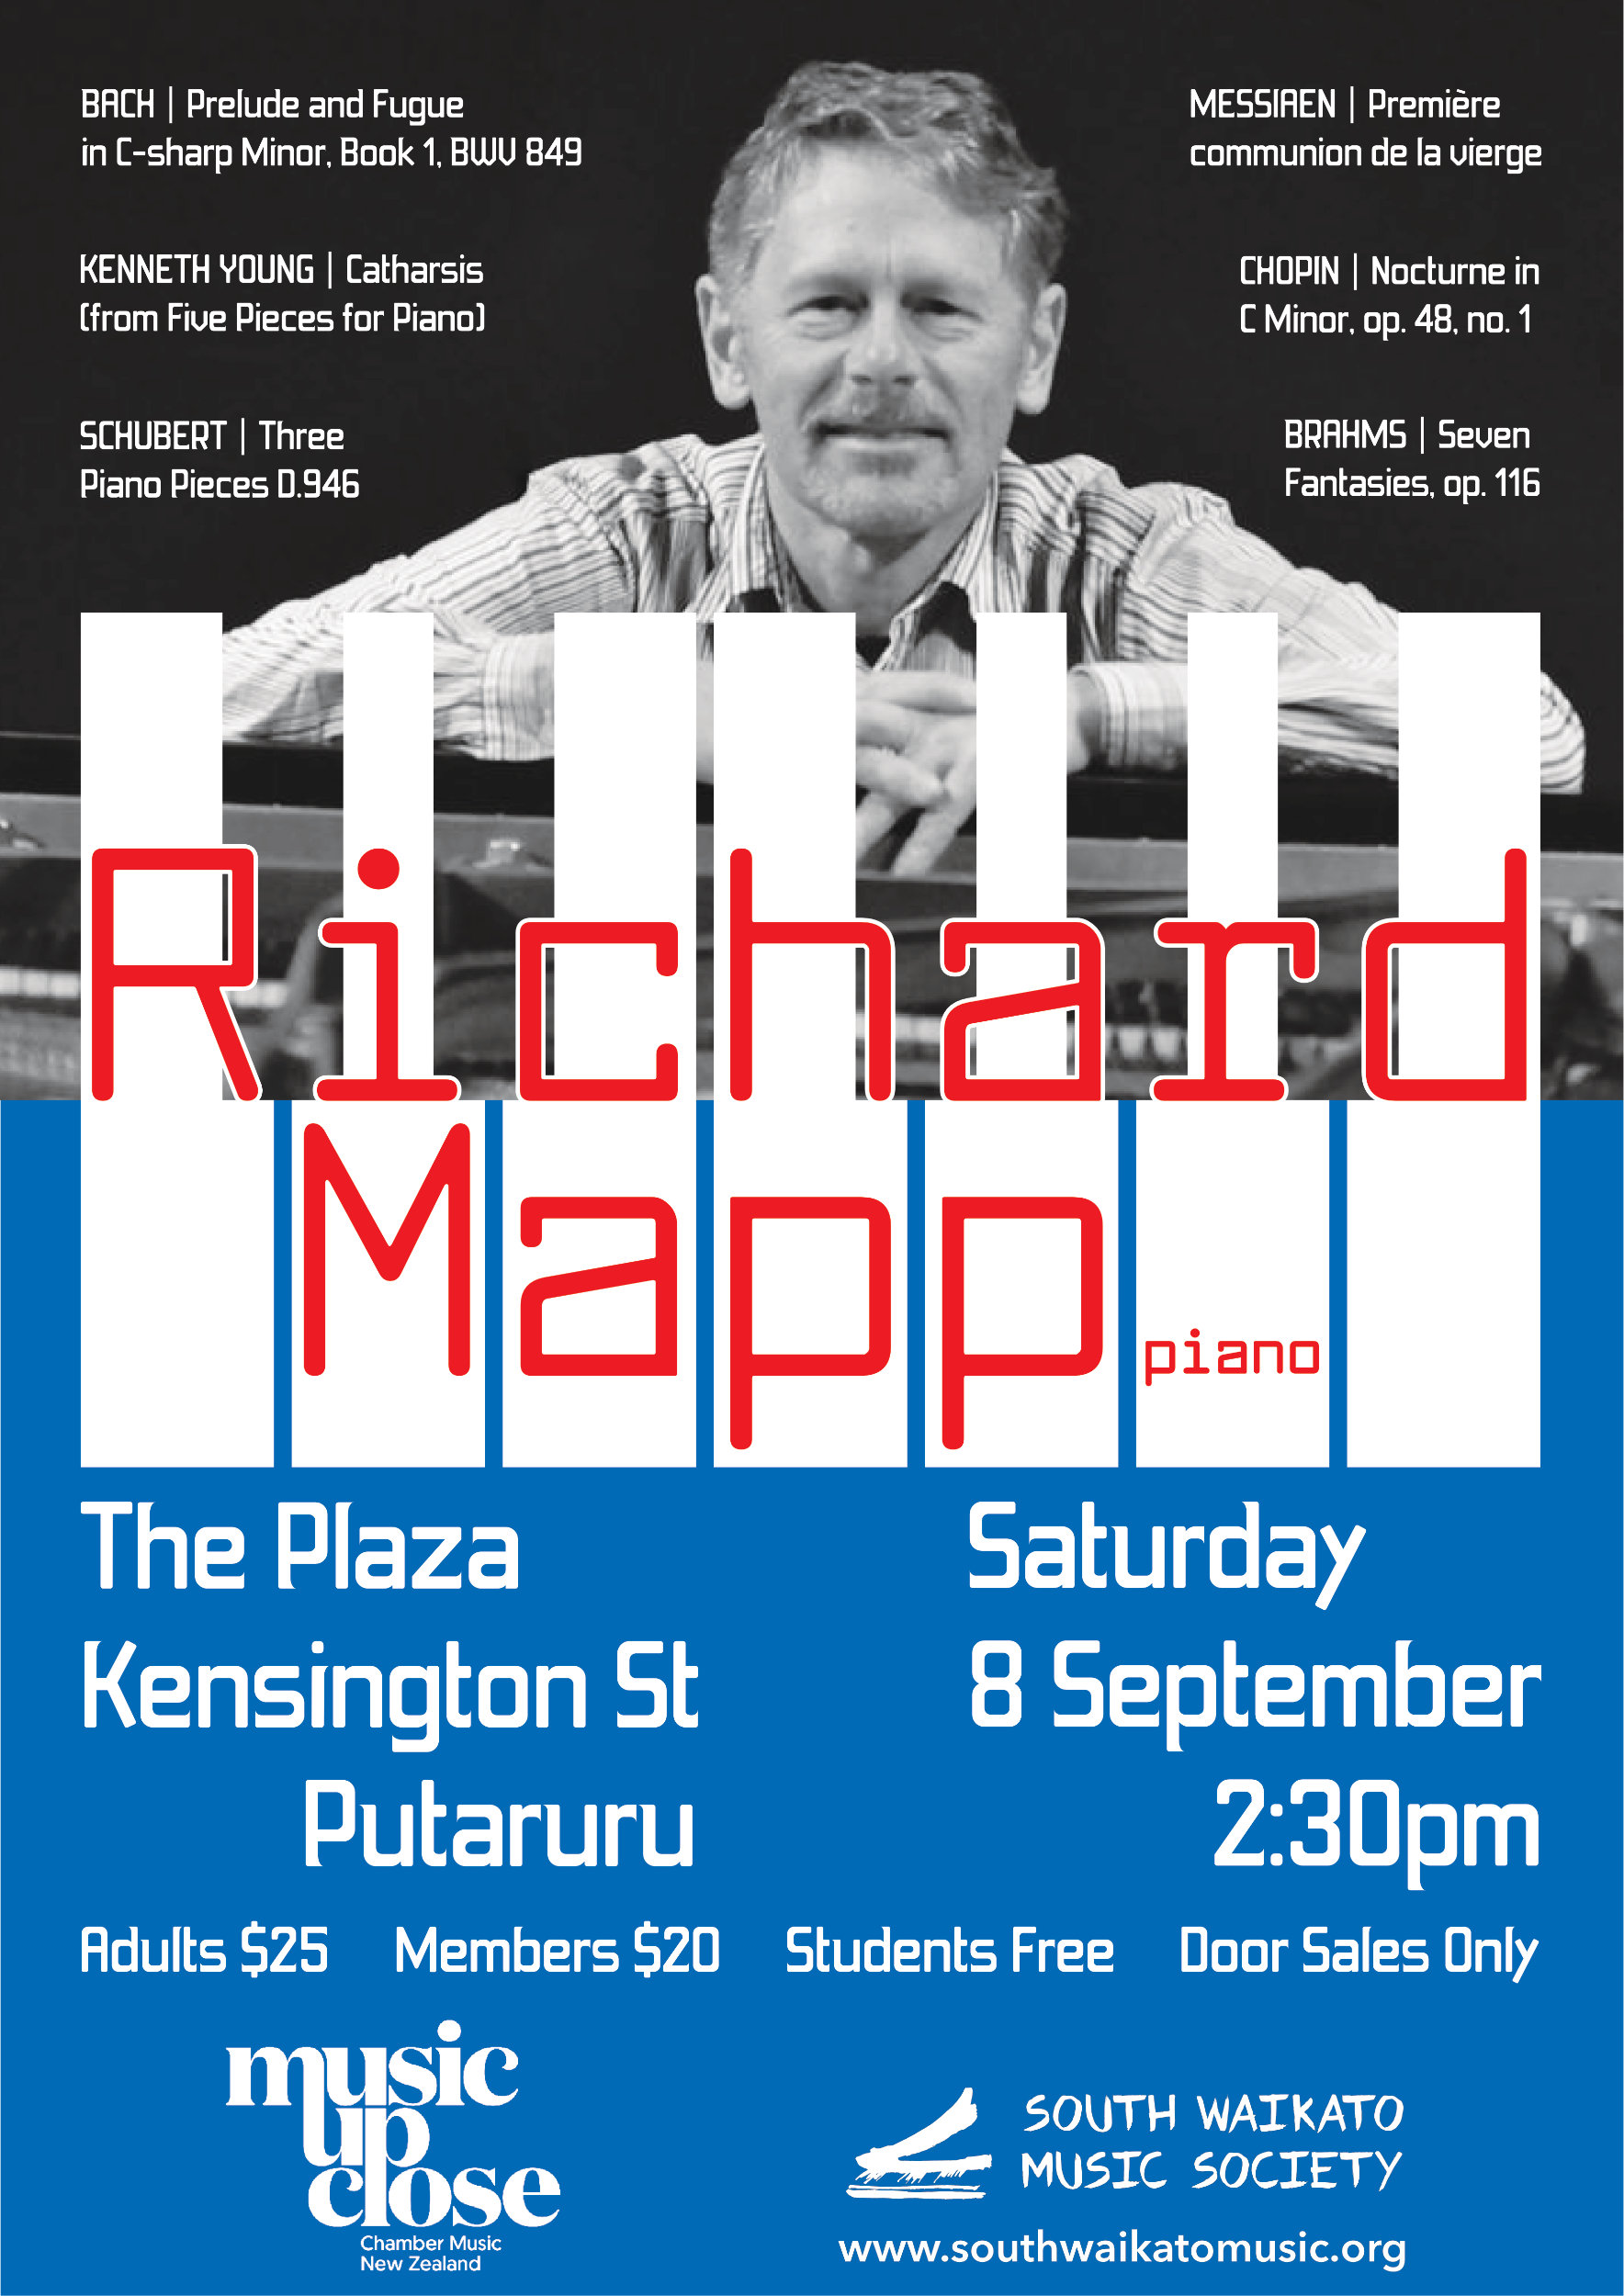 R Mapp poster.jpg